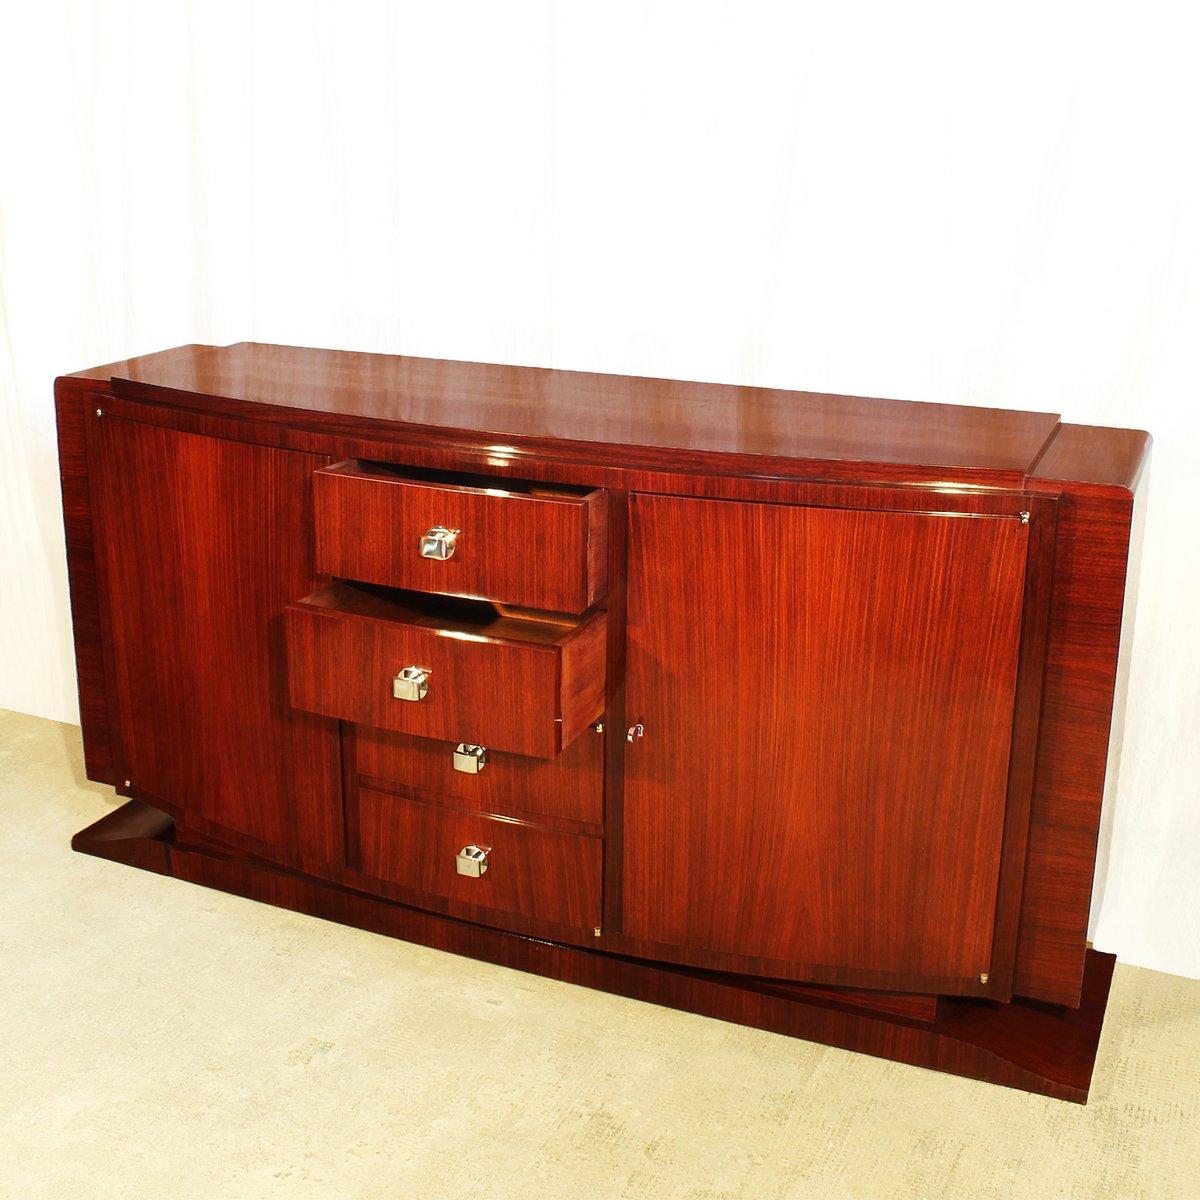 French art deco mahogany rosewood sideboard 1930s for - Deko sideboard ...